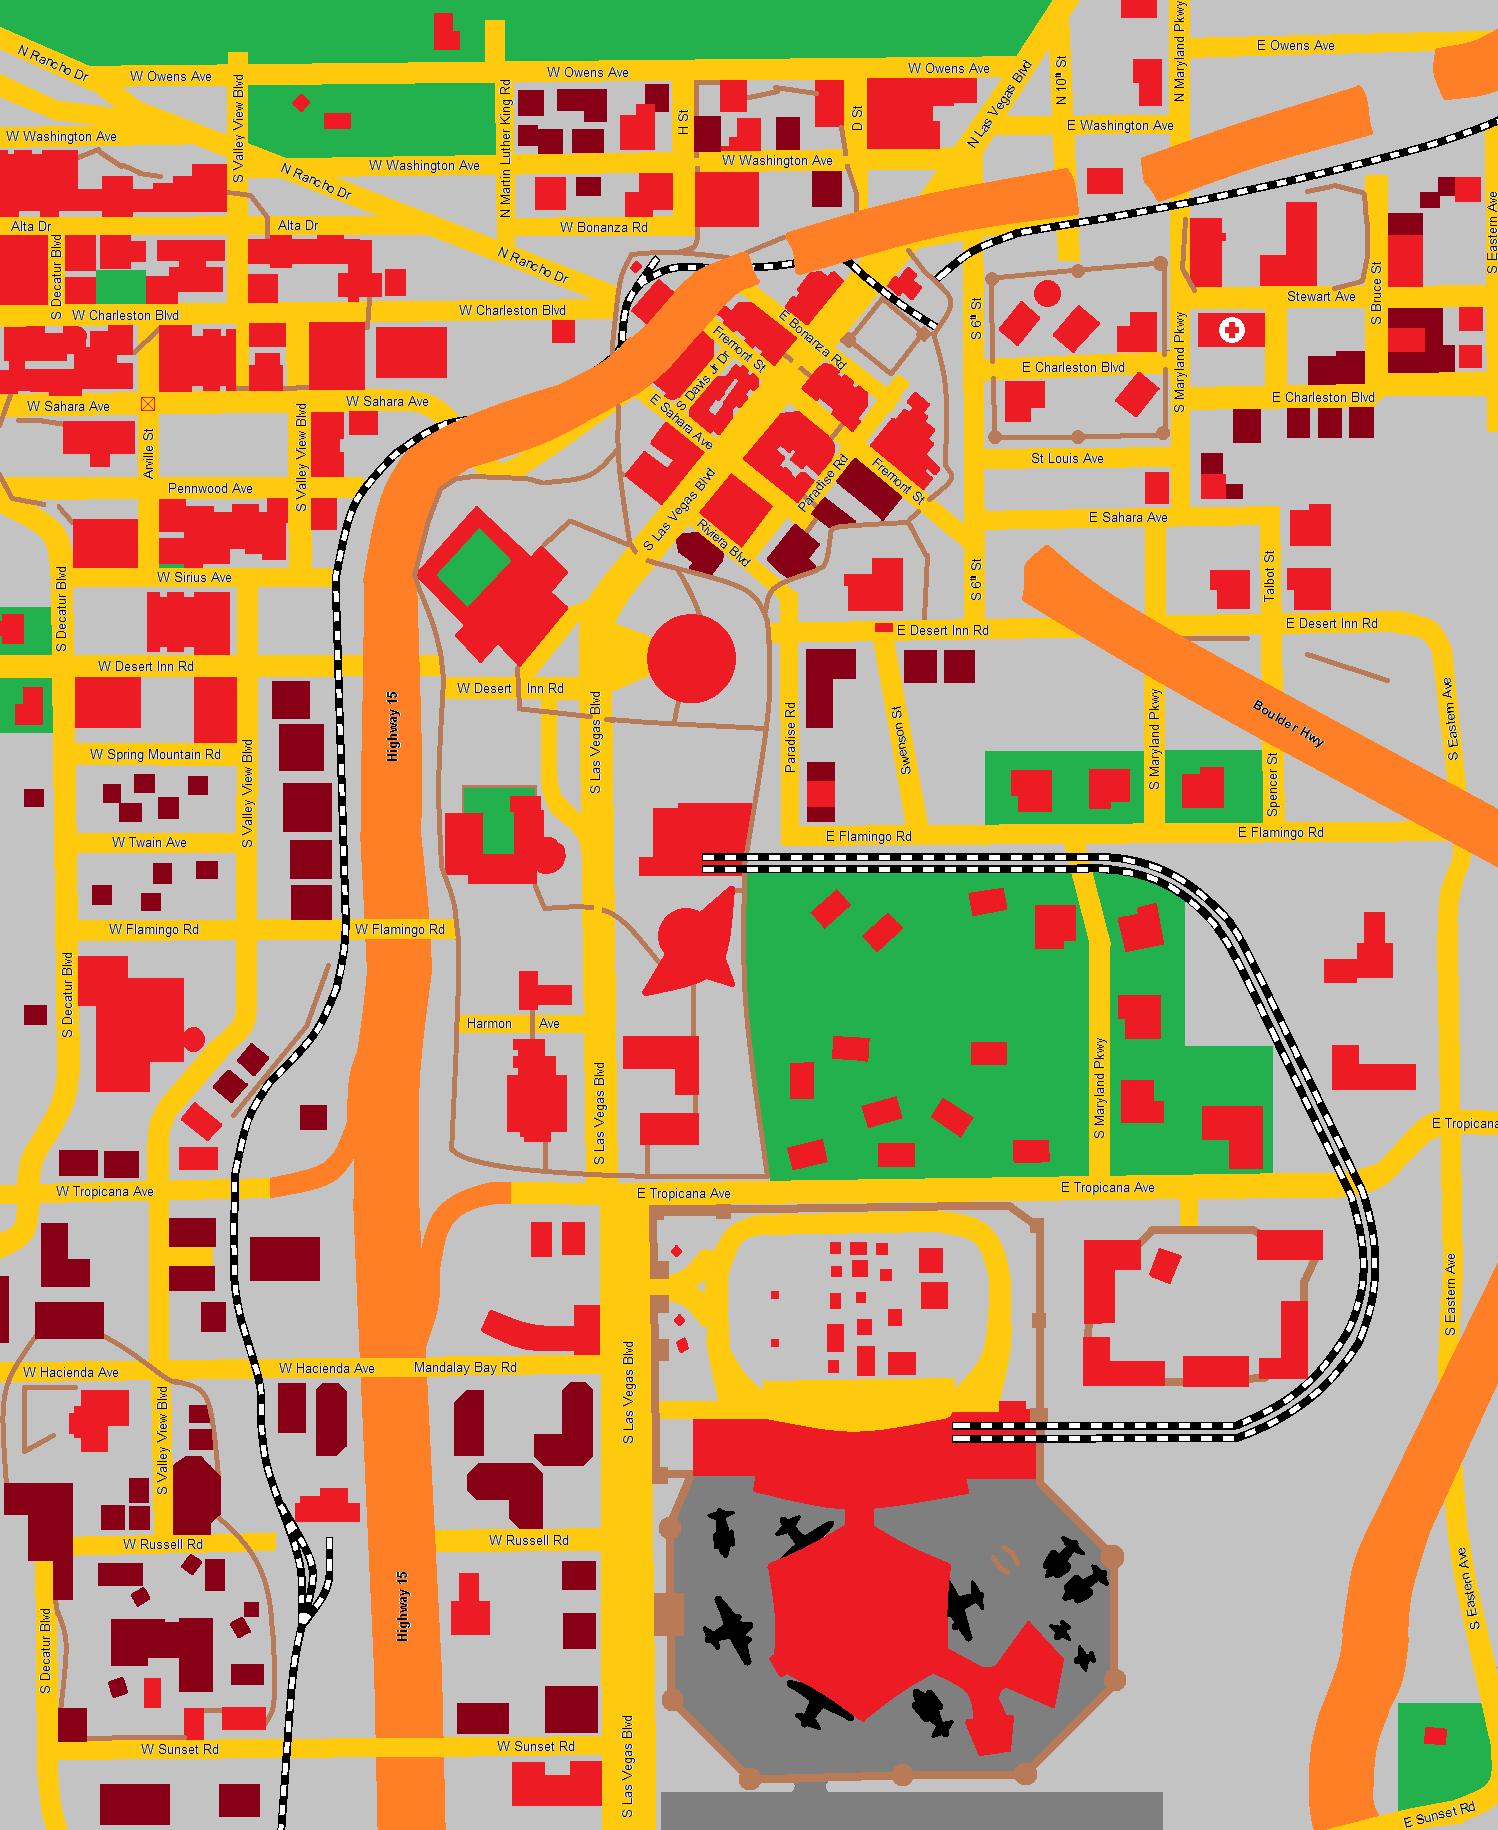 Fallout New Vegas Karte Mit Allen Orten Deutsch.New Vegas Markierte Orte Fallout Area